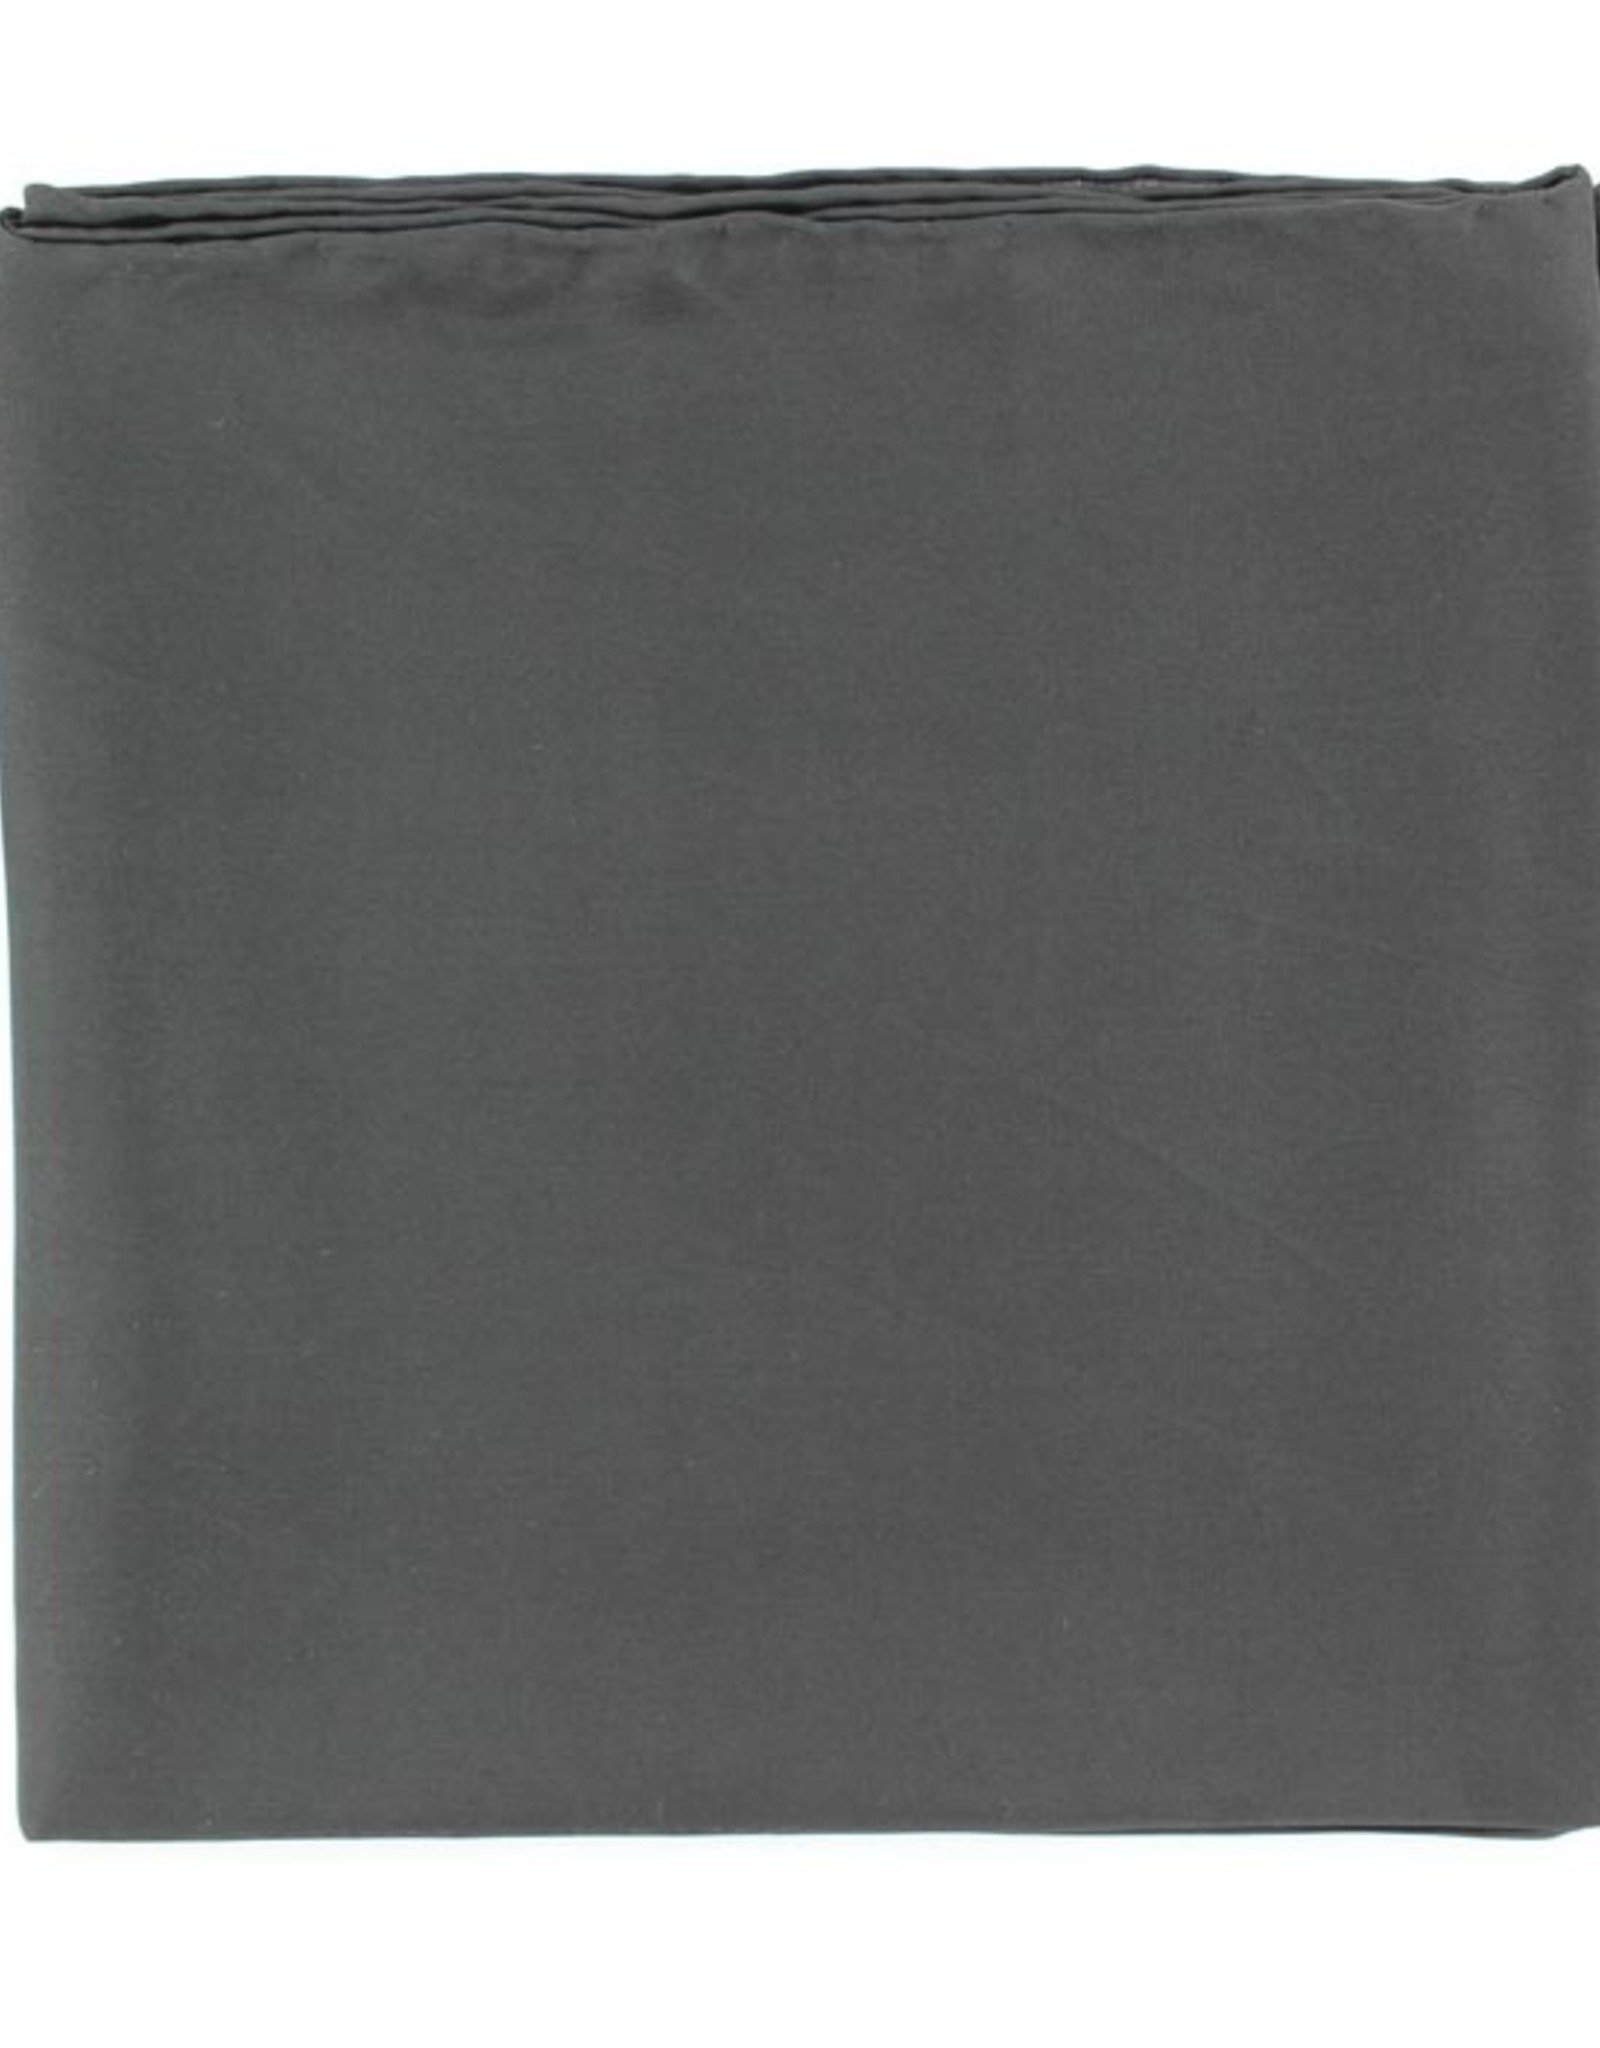 Wild Rag 100% Silk Solid Black 35x35